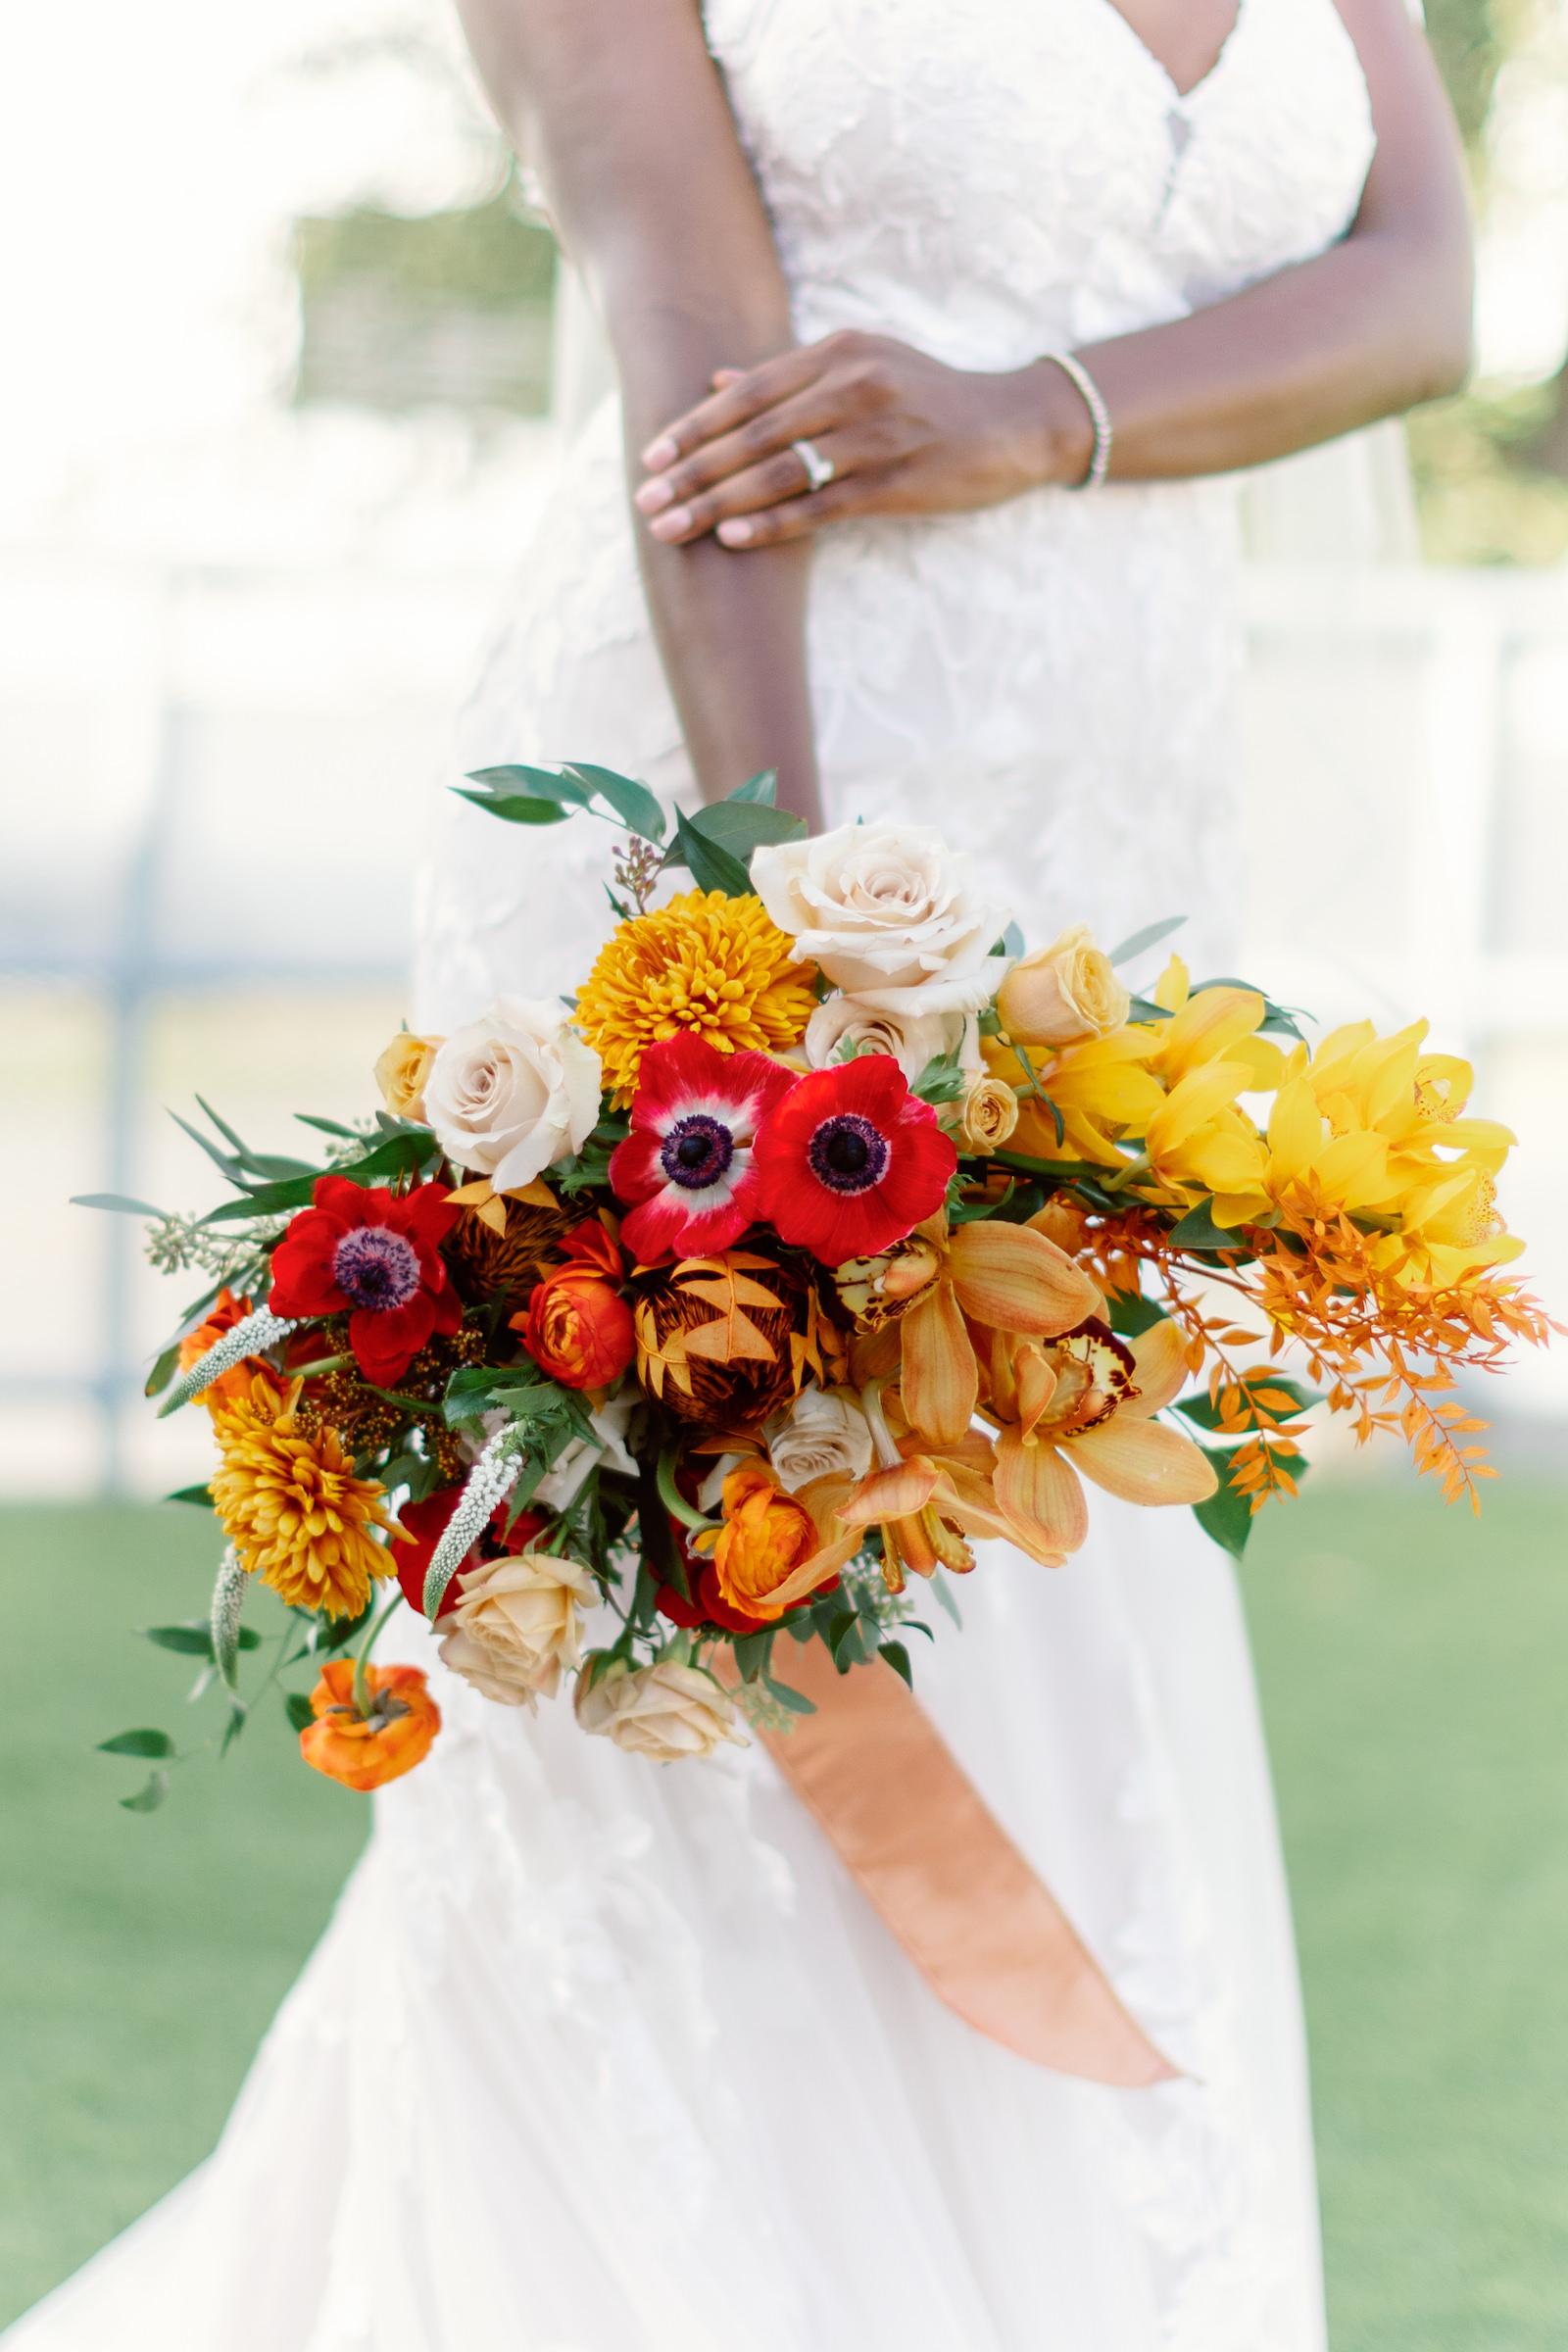 Autumn Inspired Florida Wedding Bouquet, Triadic Orange Color Palette, Red Posies, Yellow Flowers, Ivory Roses, Orange Florals with Dark Greenery   Tampa Bay Wedding Planner Coastal Coordinating, Jessica Zenobi